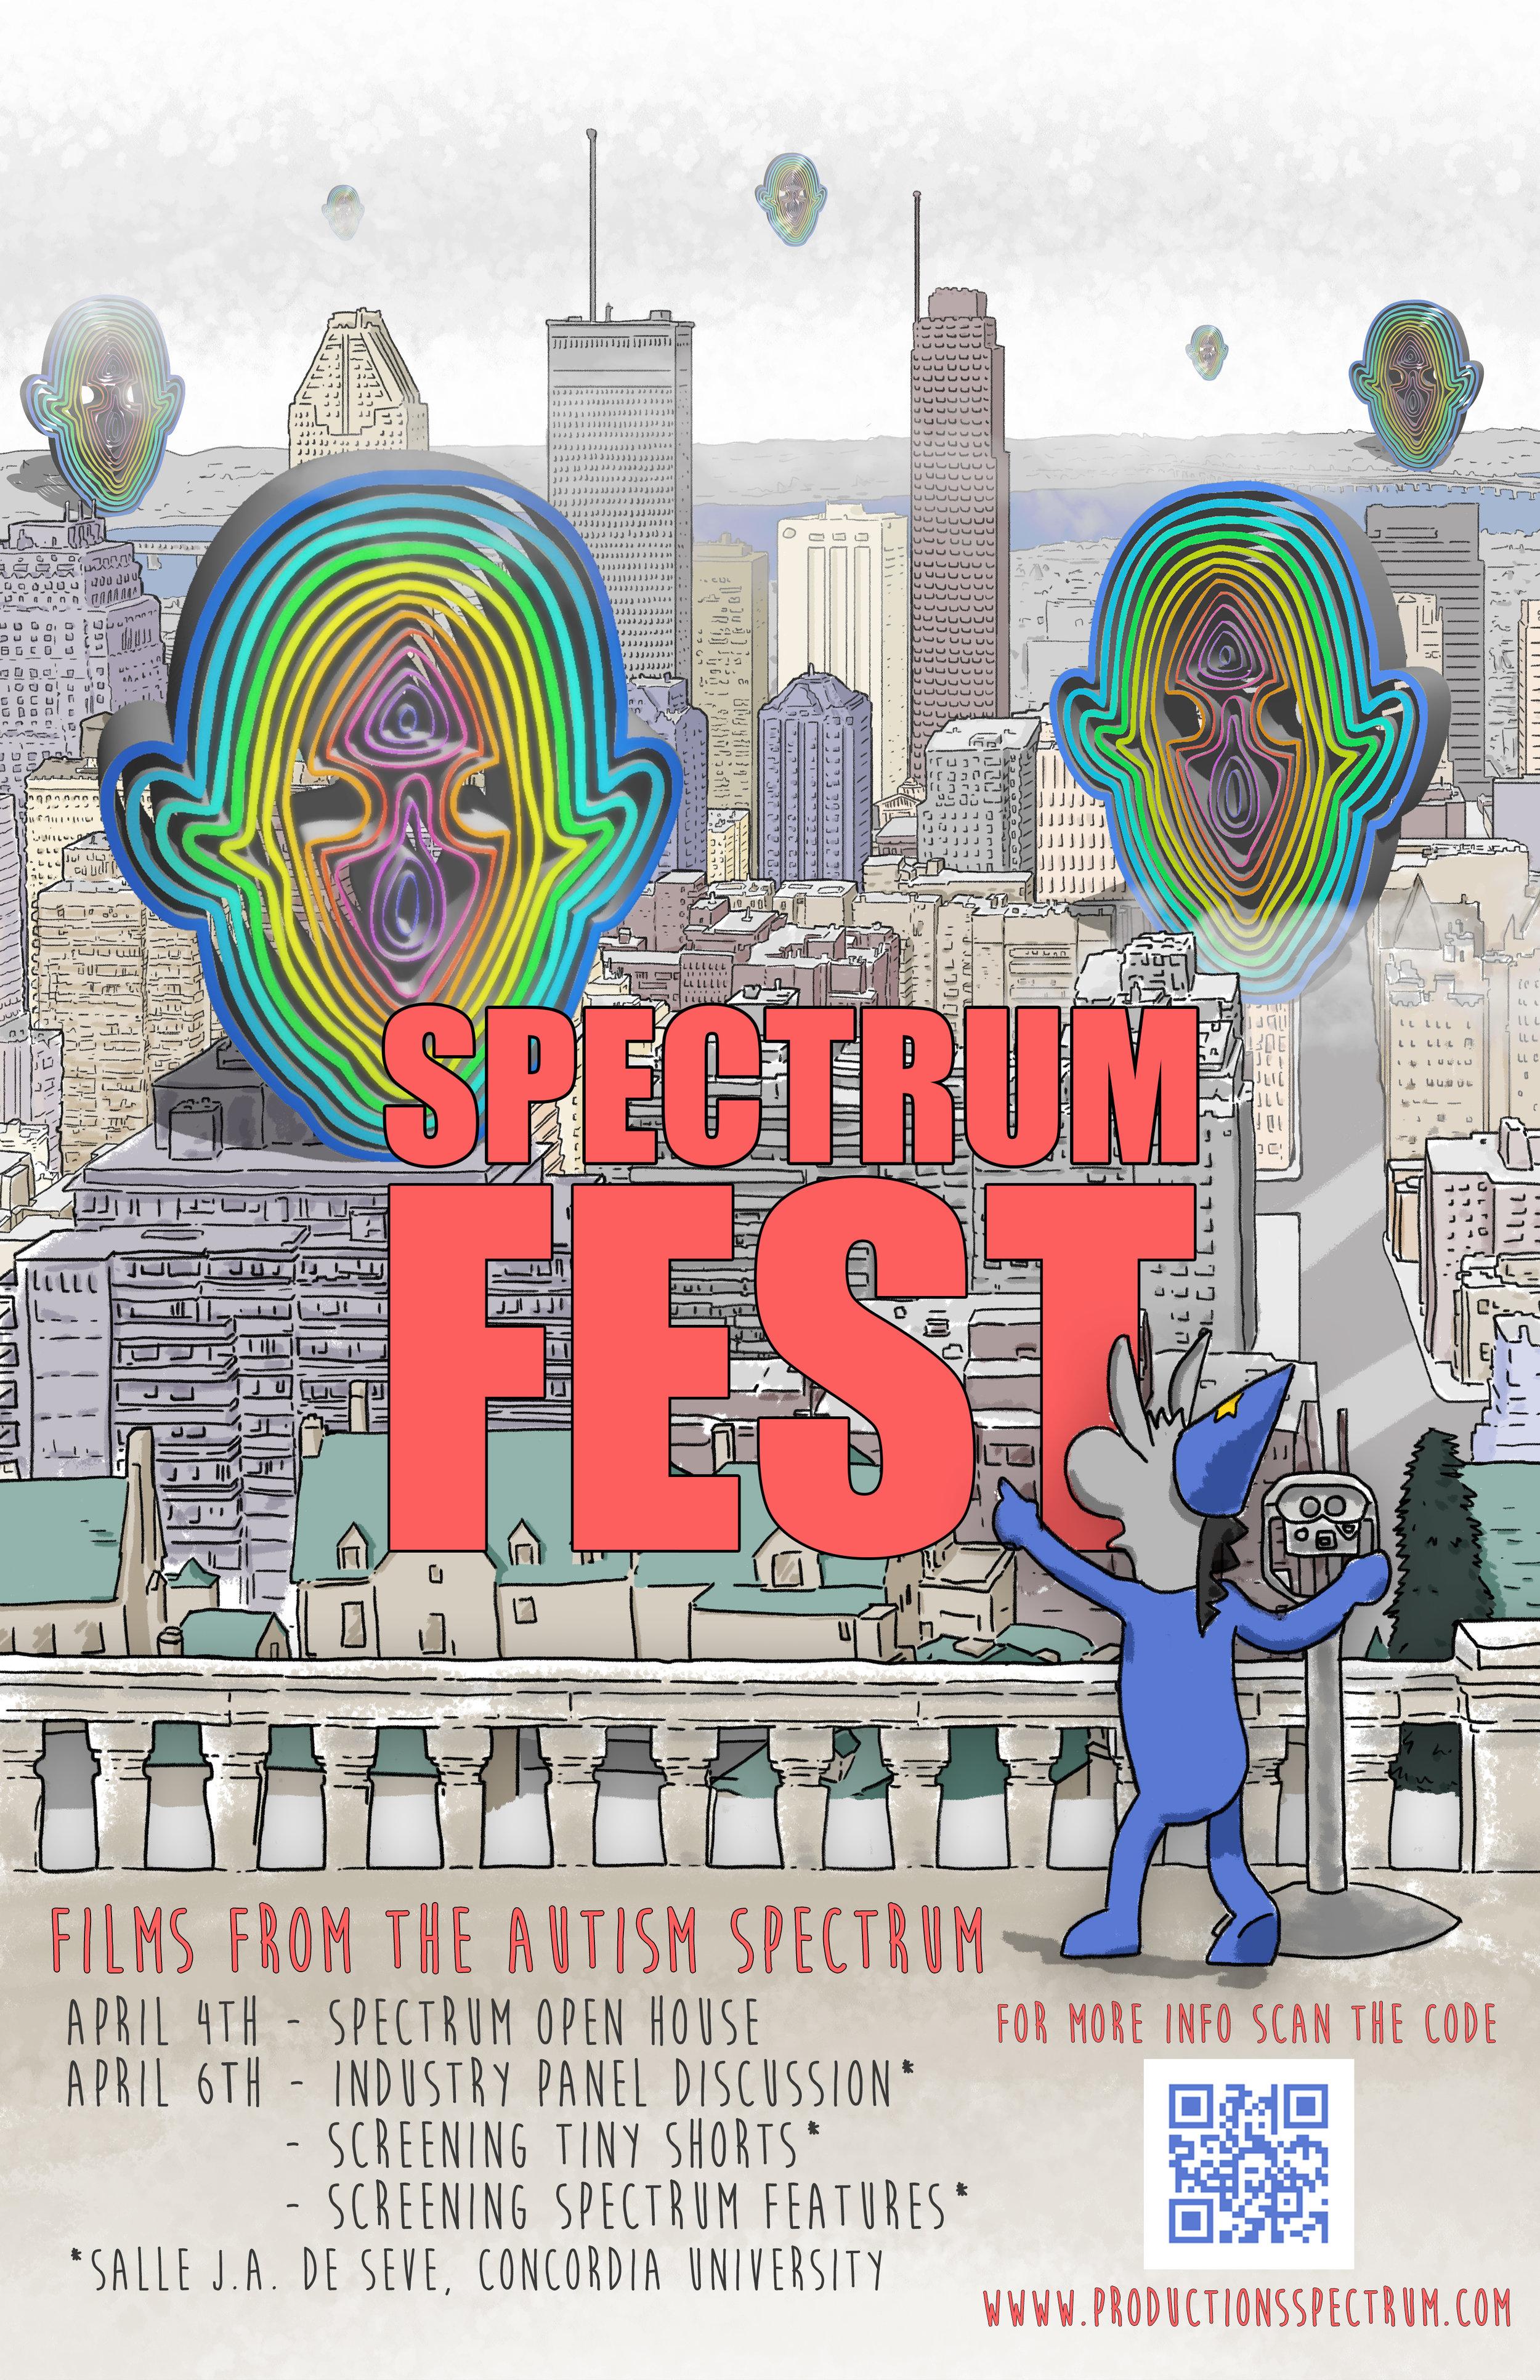 SPECTRUMFEST_2019_11x17-reprint.jpg